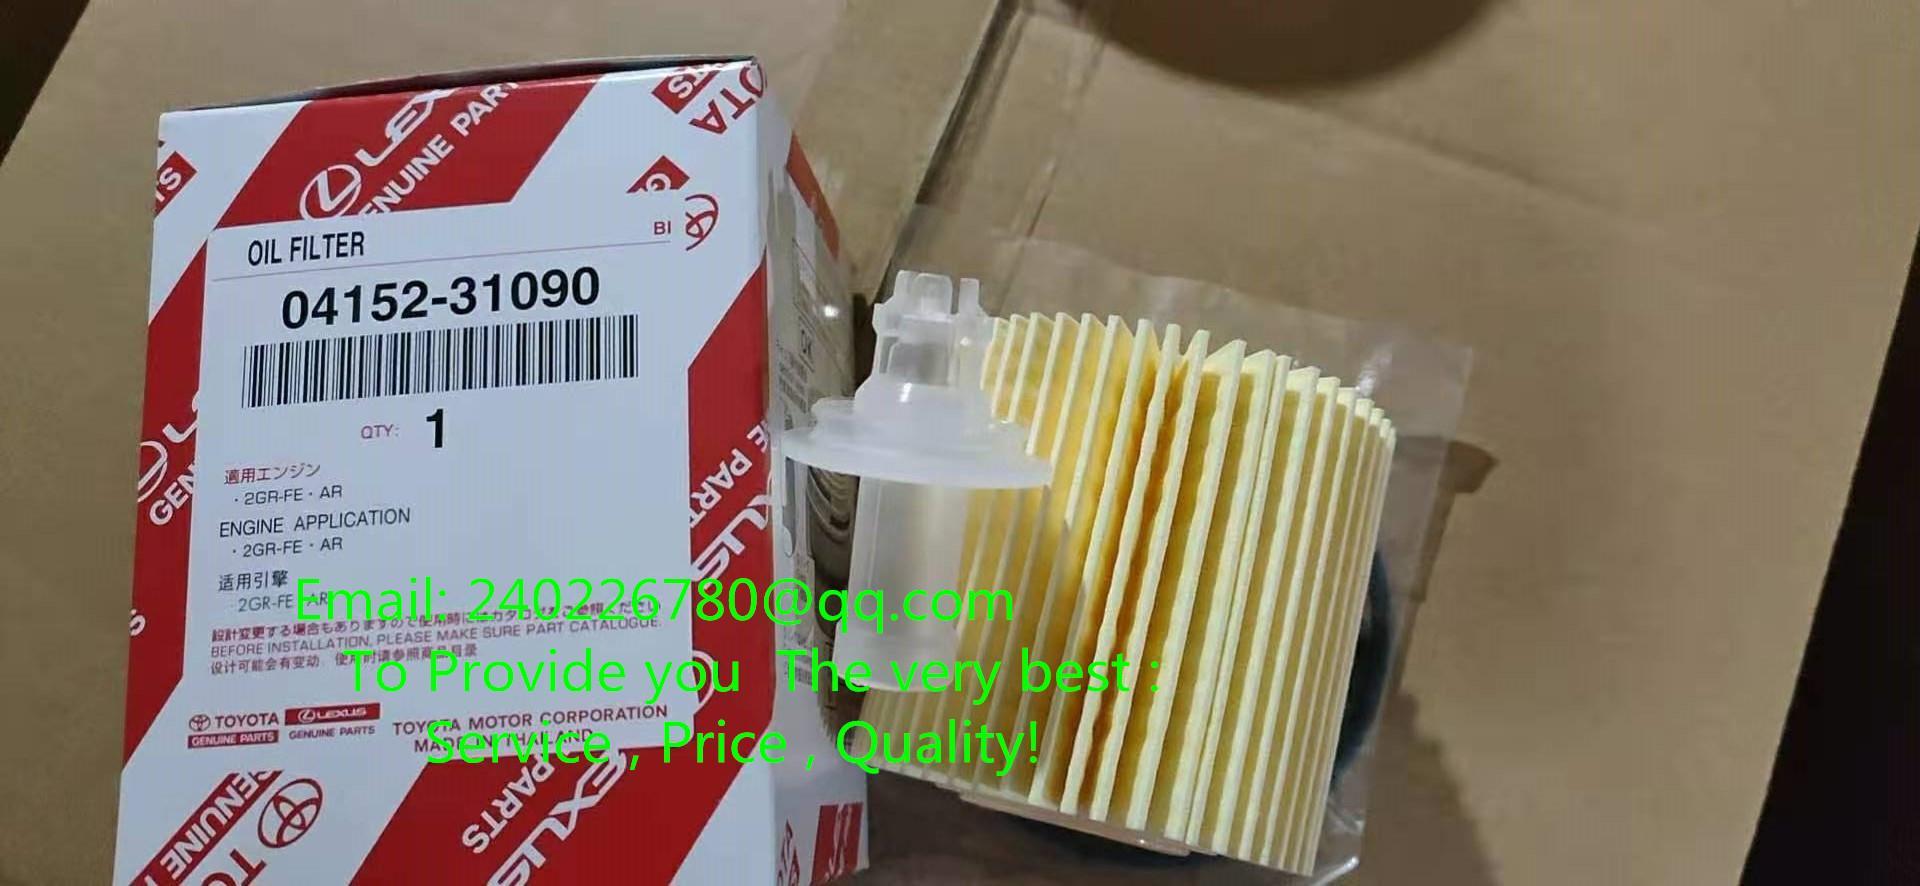 FOR TOYOTA Highlander, RAV 4 /Camry /Corolla,LEXUS ES200/ES350/RX350/ RX450H,LEXUS NX200 RX200  04152-31090 04152-31110 04152-YZZA1 04152-0P010 04152-0V010 04152-YZZA1 04152-YZZA8 0415231090  0415231110  04152YZZA1  04152YZZA8  041520V010 041520P010